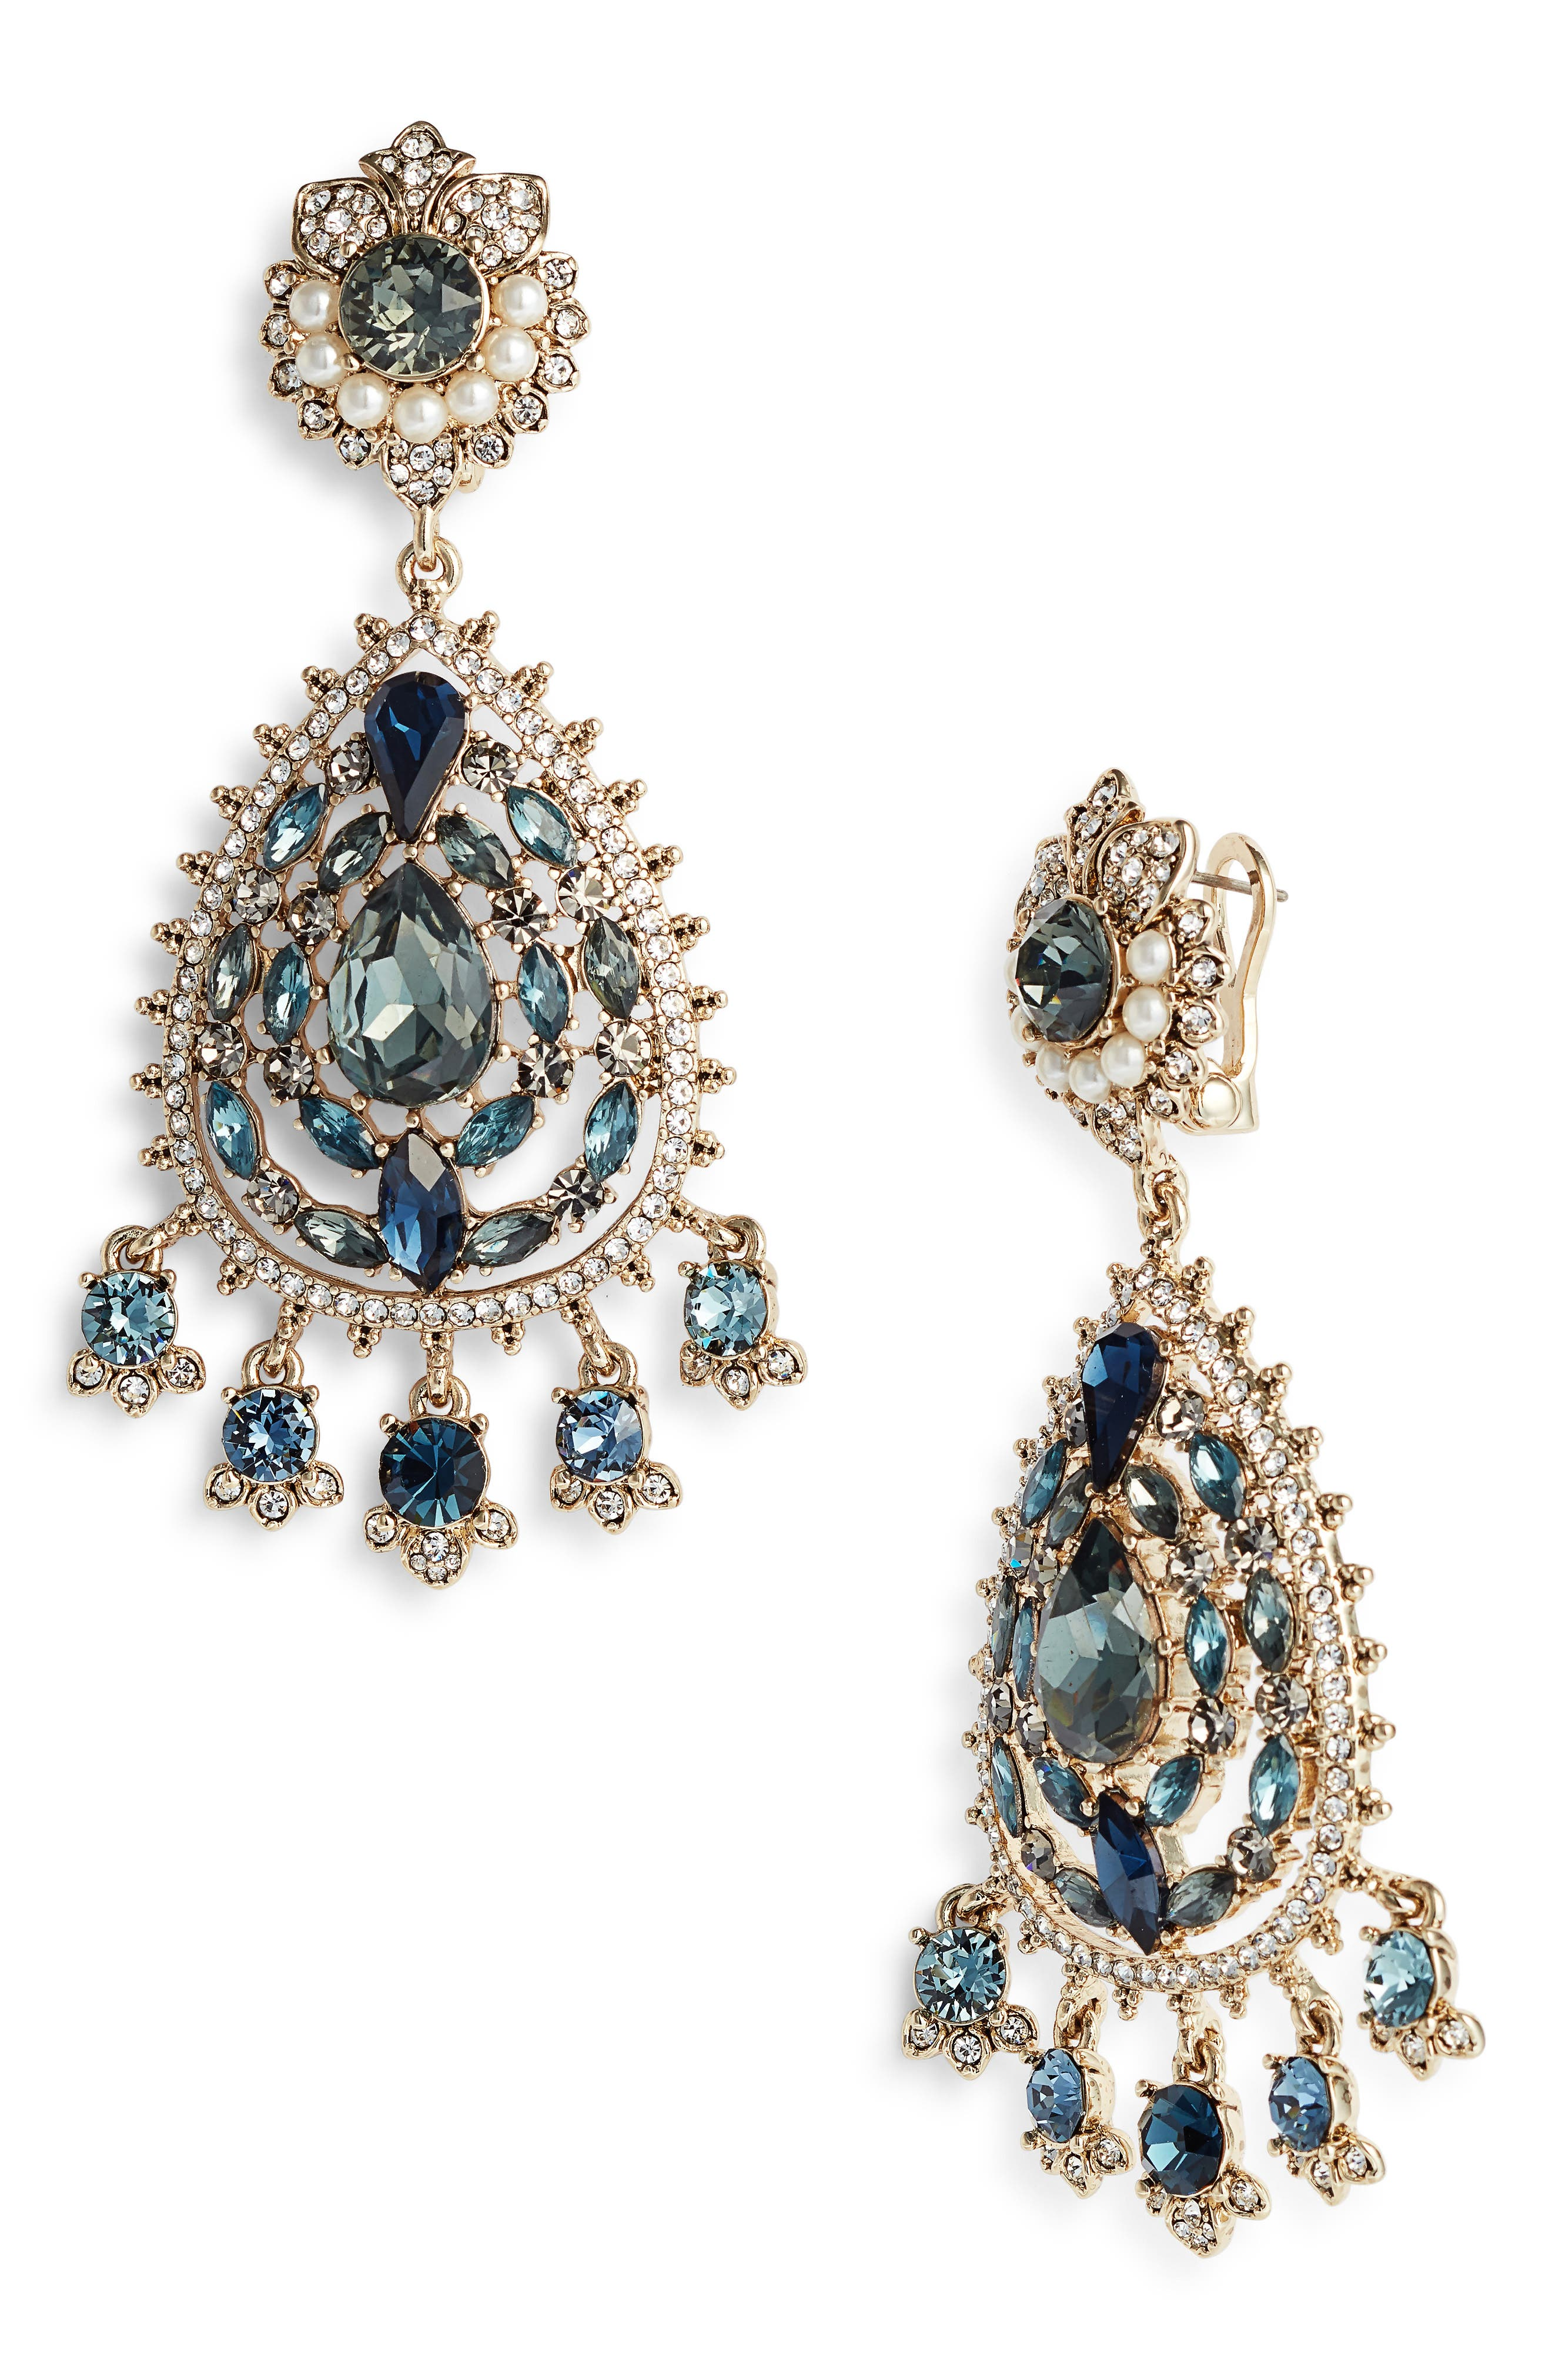 MARCHESA, Chandelier Earrings, Main thumbnail 1, color, BLUE MULTI/ GOLD